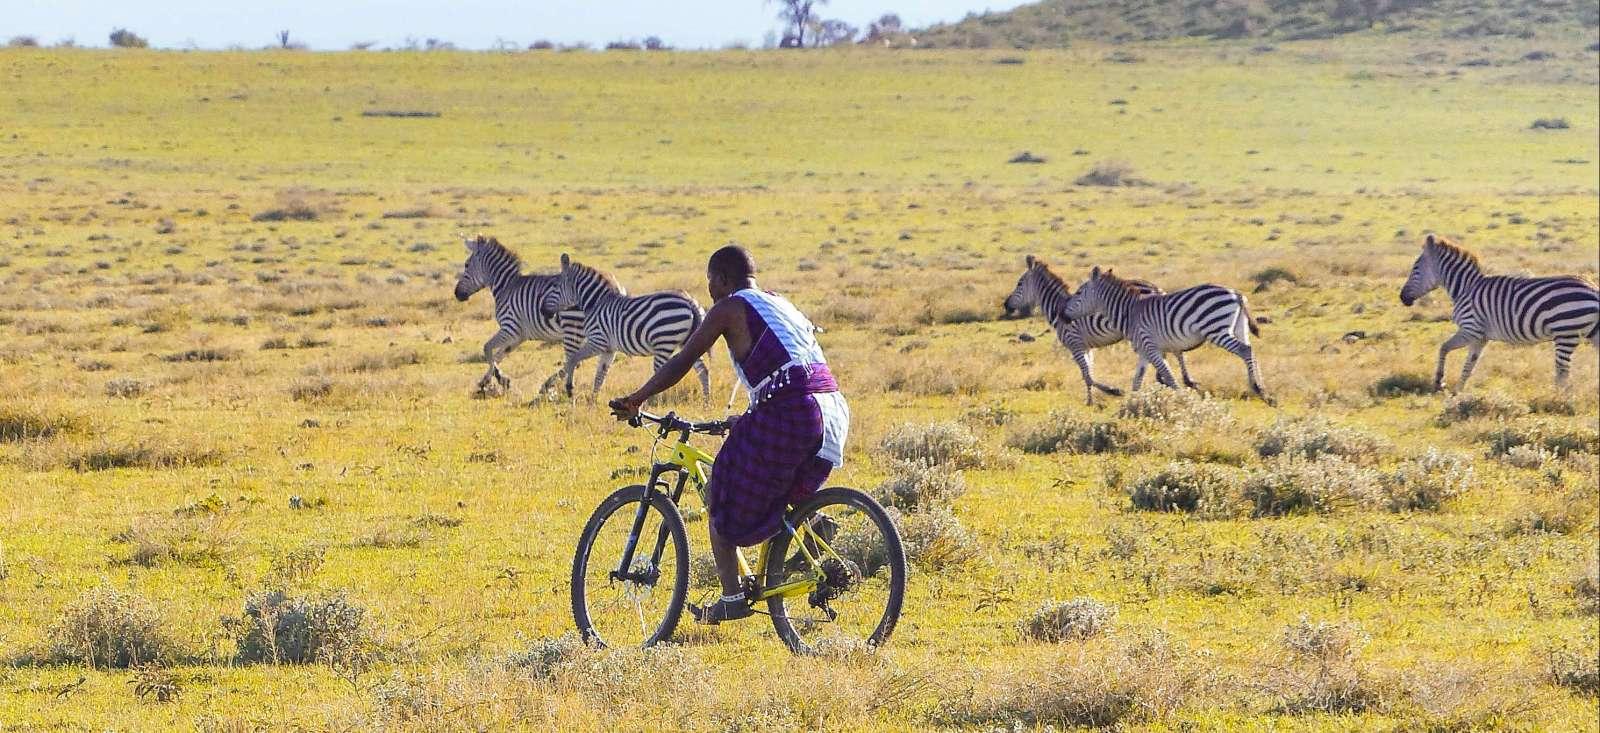 Voyage avec des animaux Tanzanie : Safari VTT en Tanzanie !